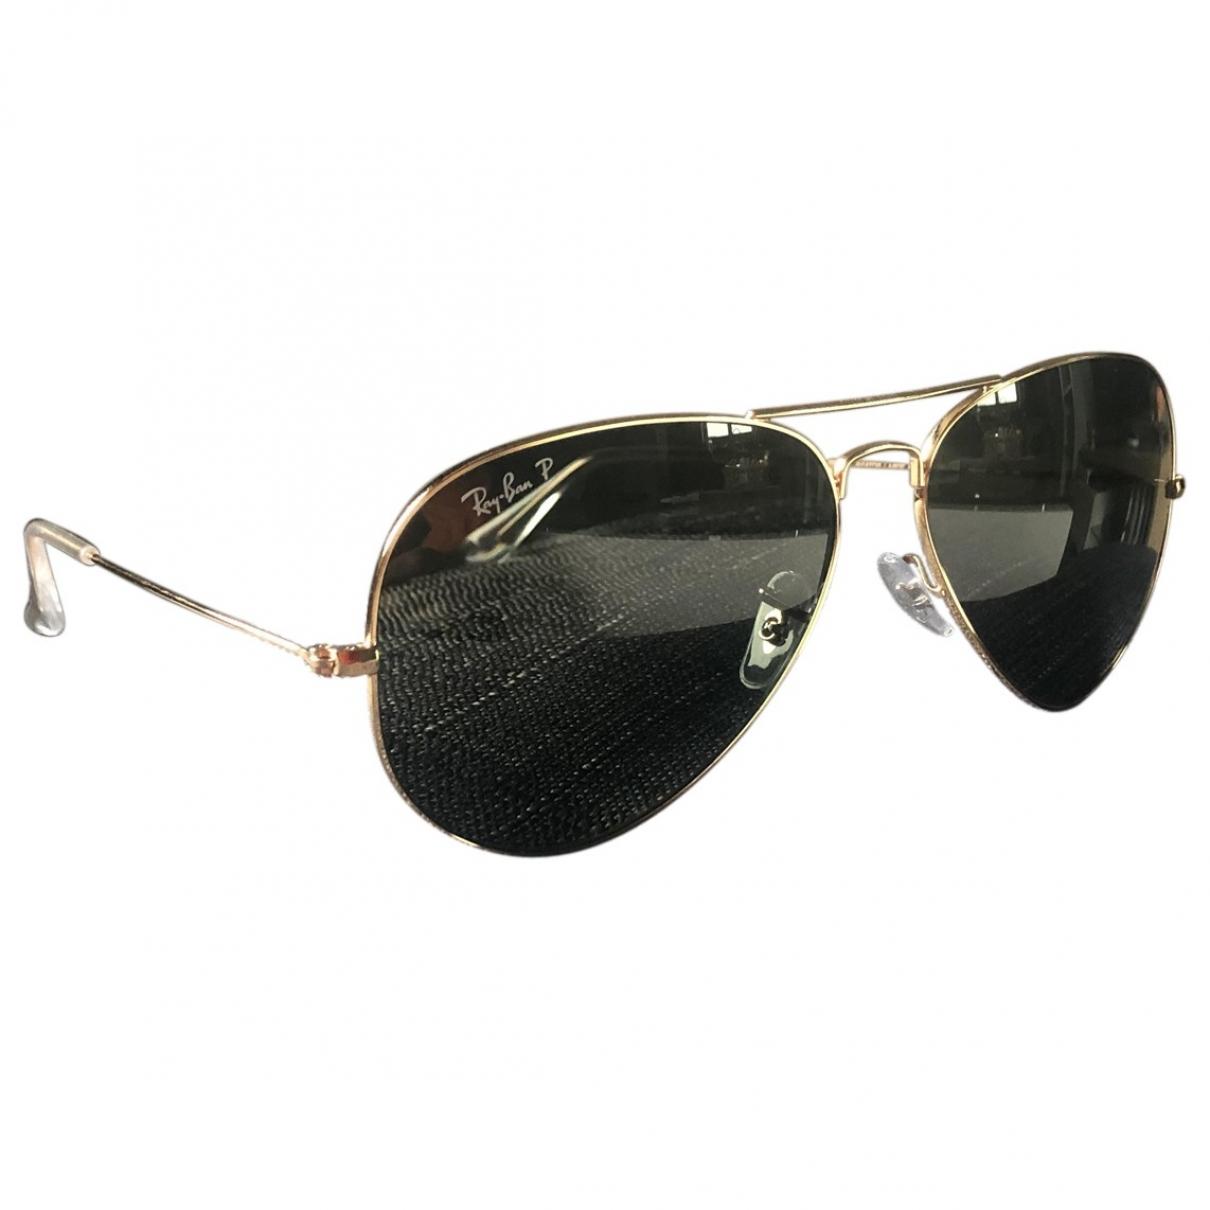 Ray-ban \N Sonnenbrillen in  Gold Metall